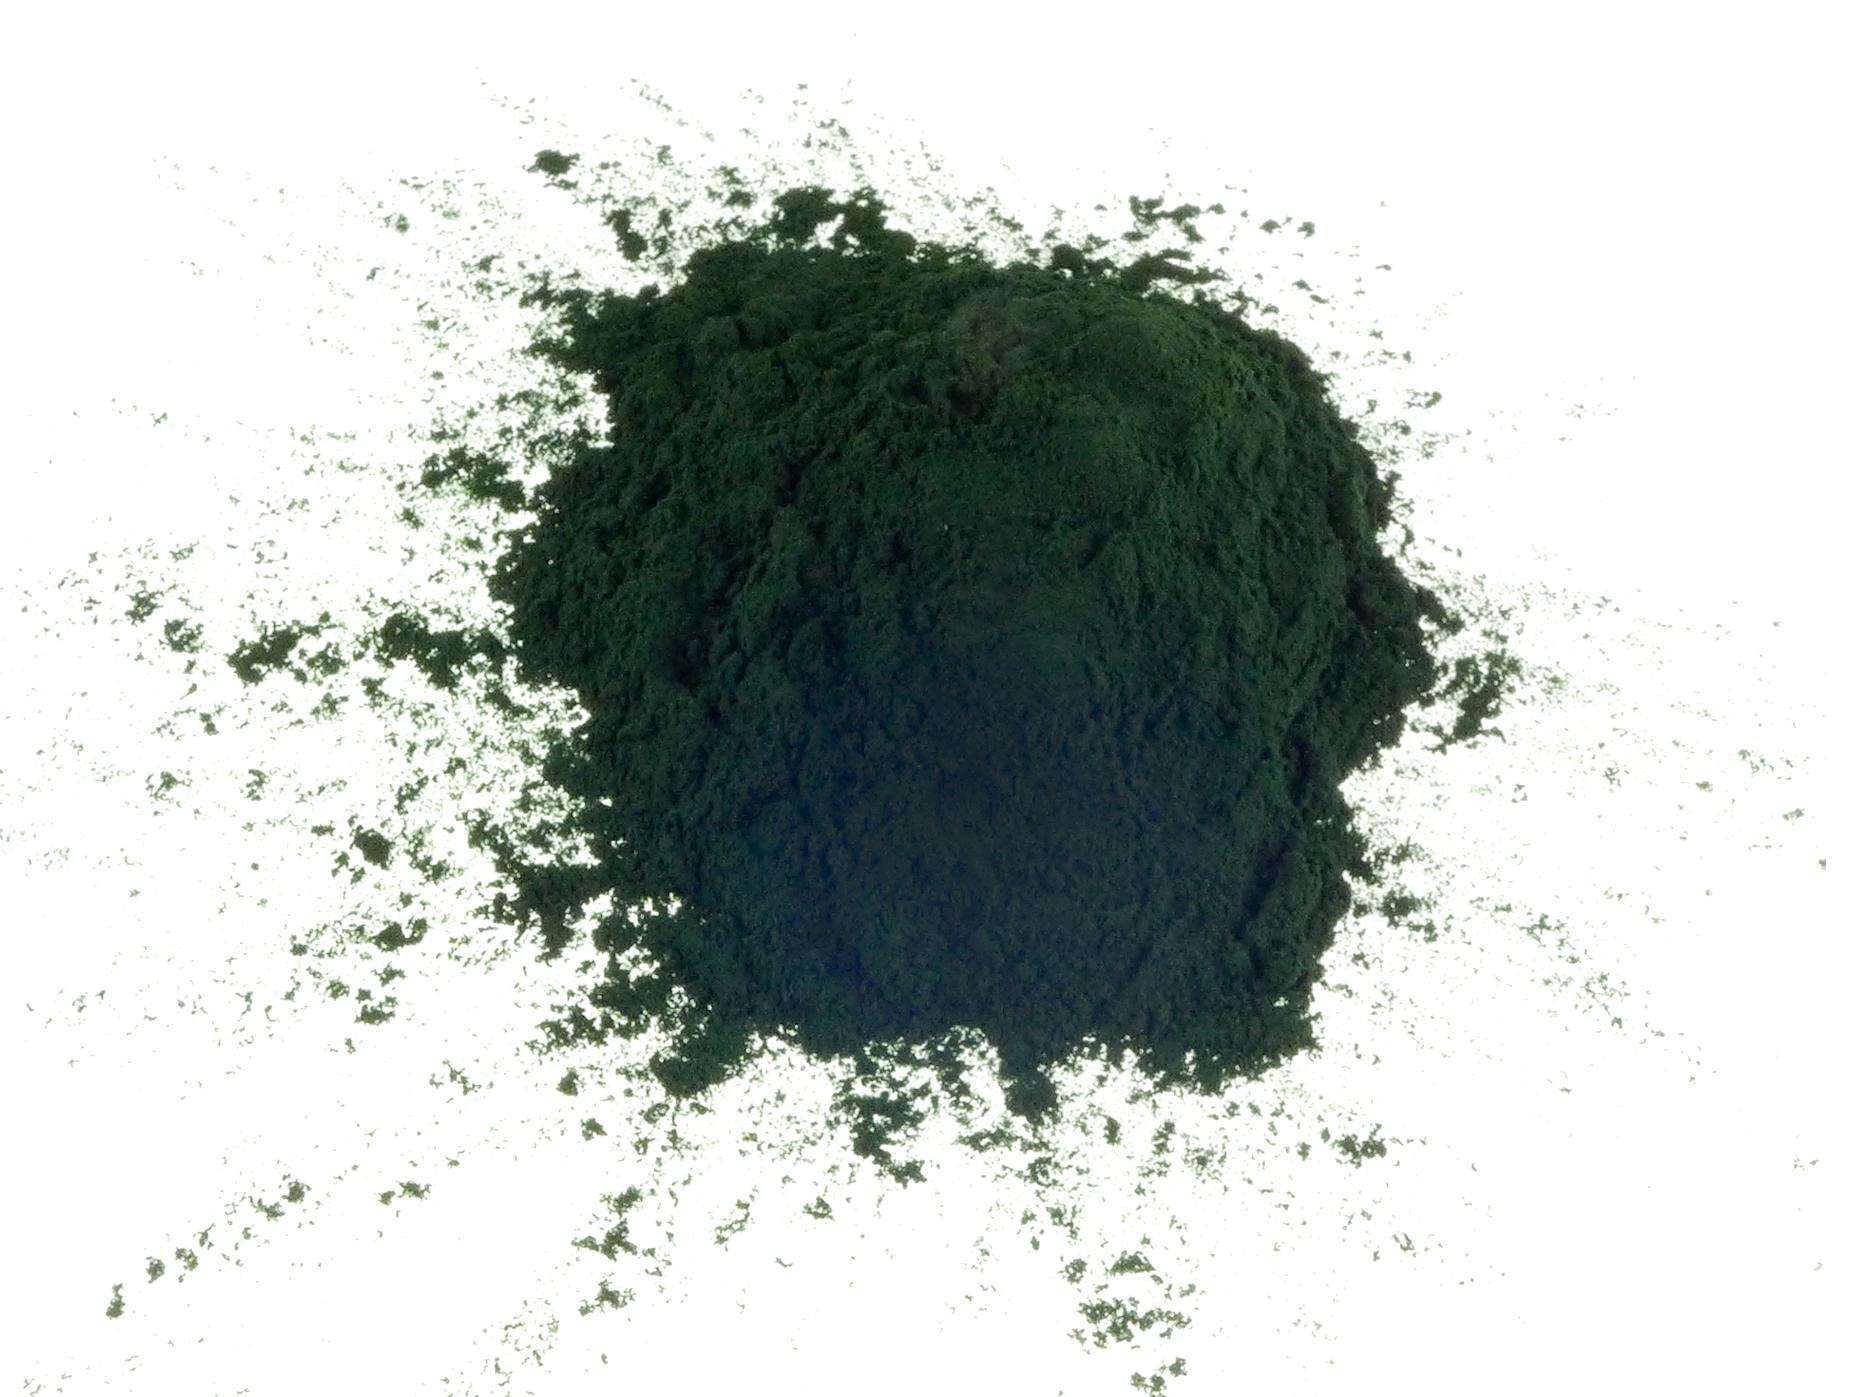 SPIRULINA powder - choose quantity - human food grade certified - bulk discount